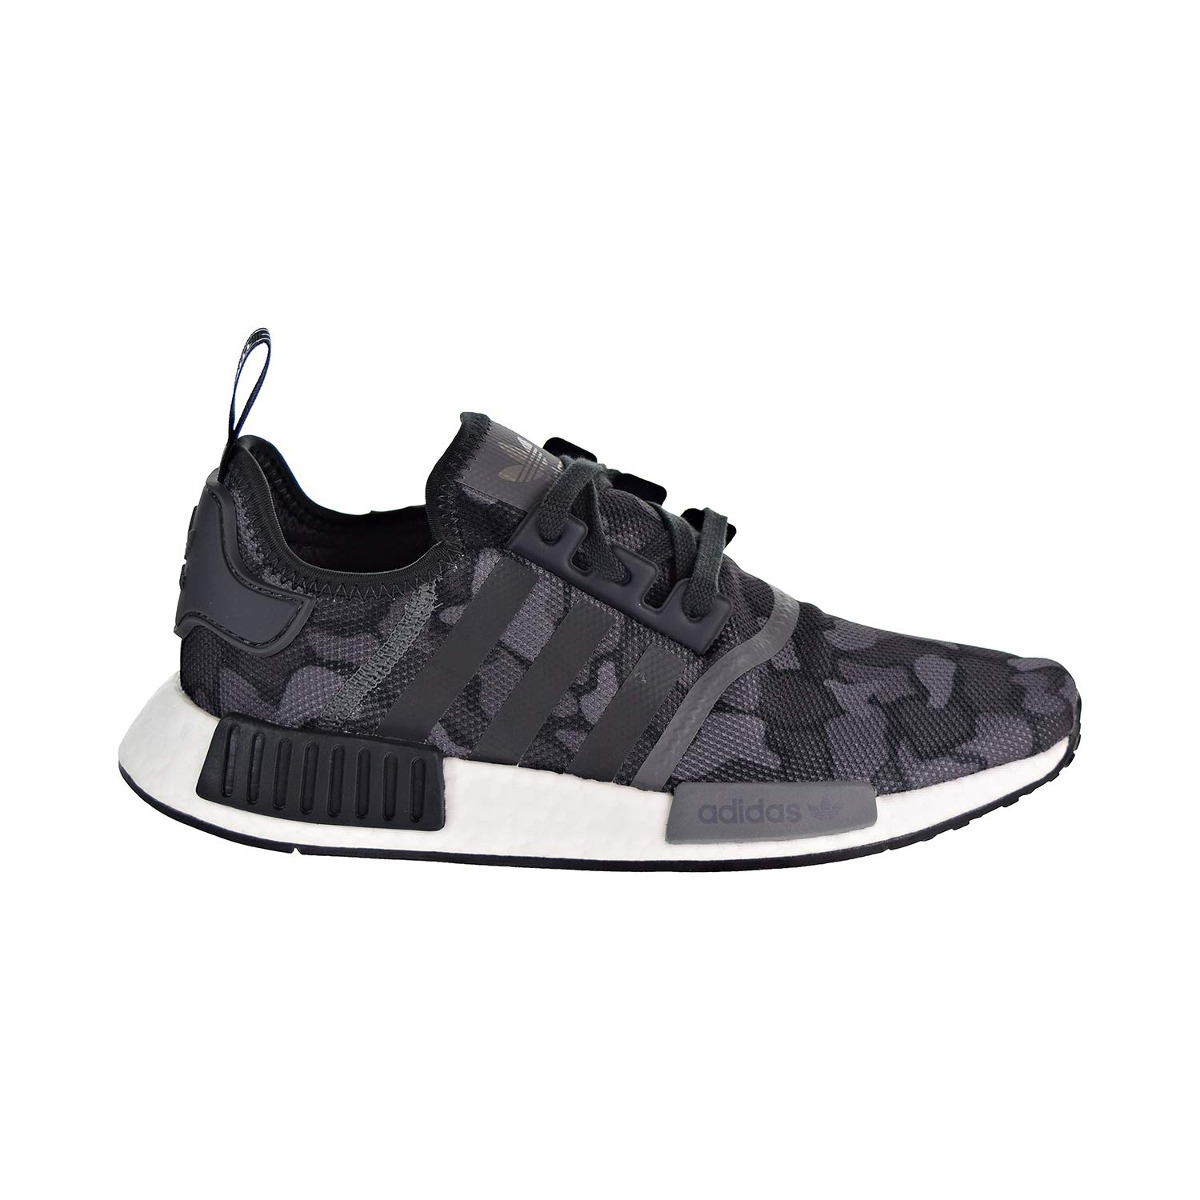 adidas zapatos hombre casual